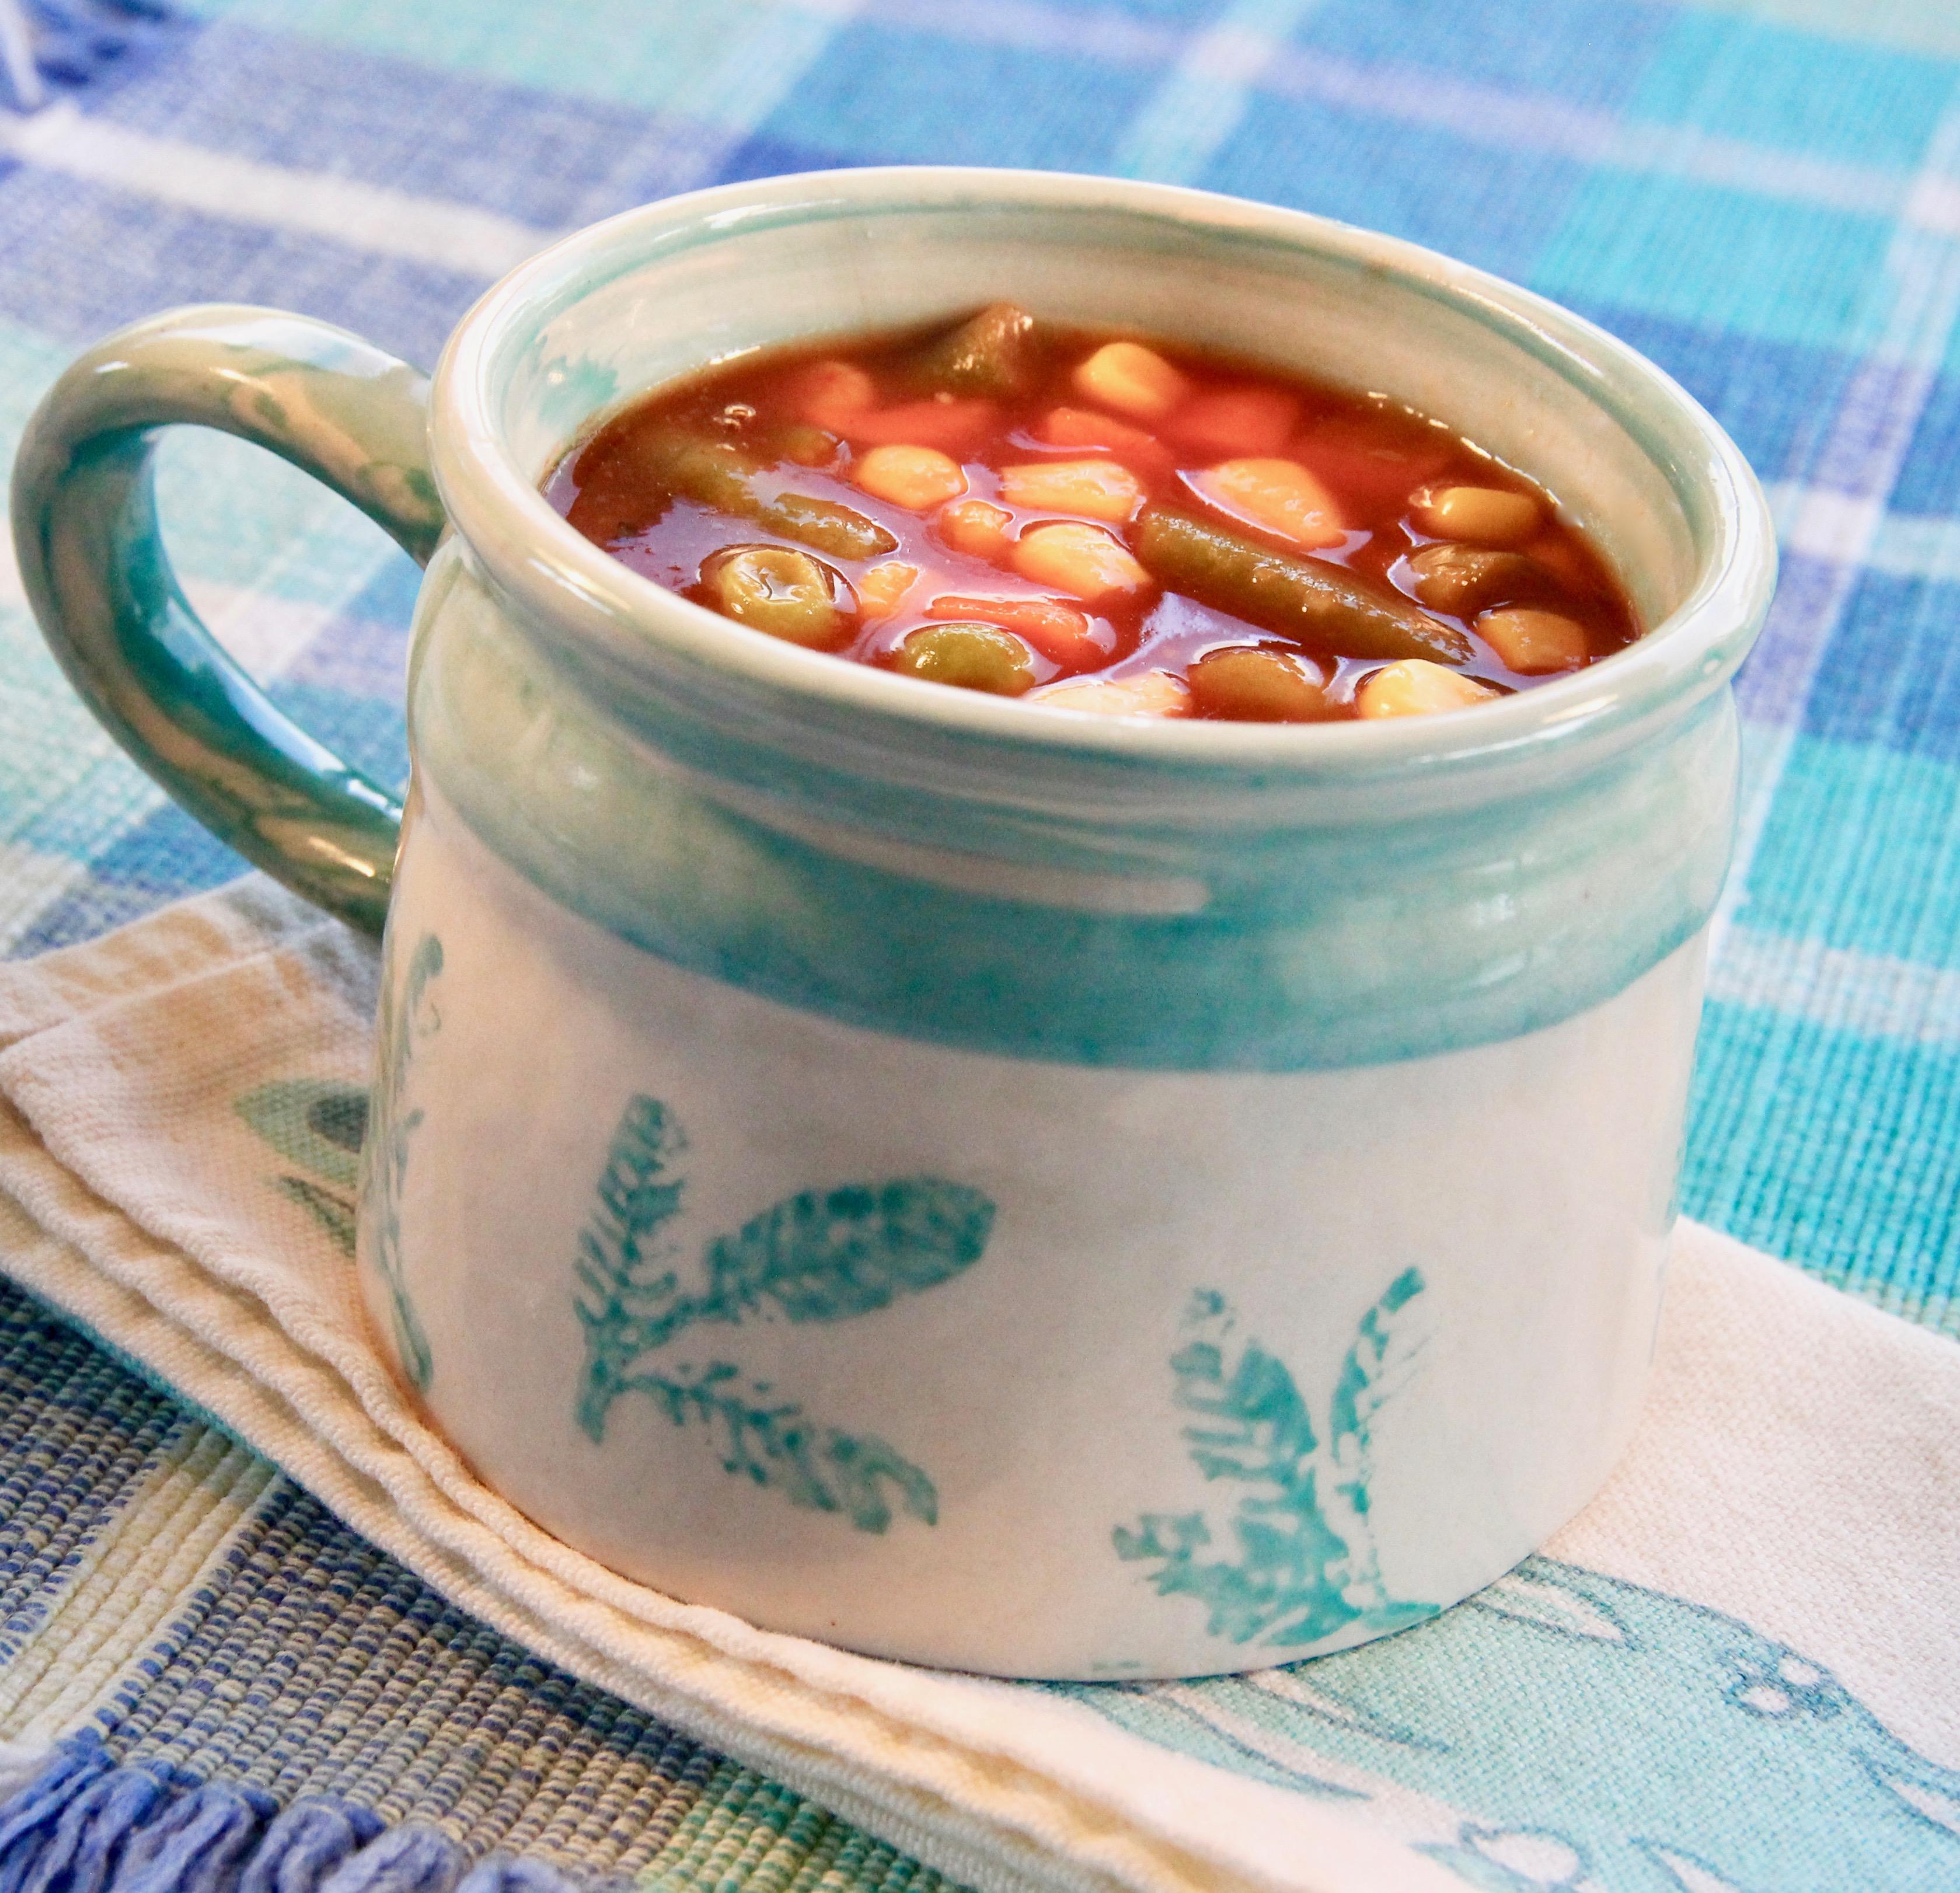 Colene's Easy Tomato Vegetable Soup